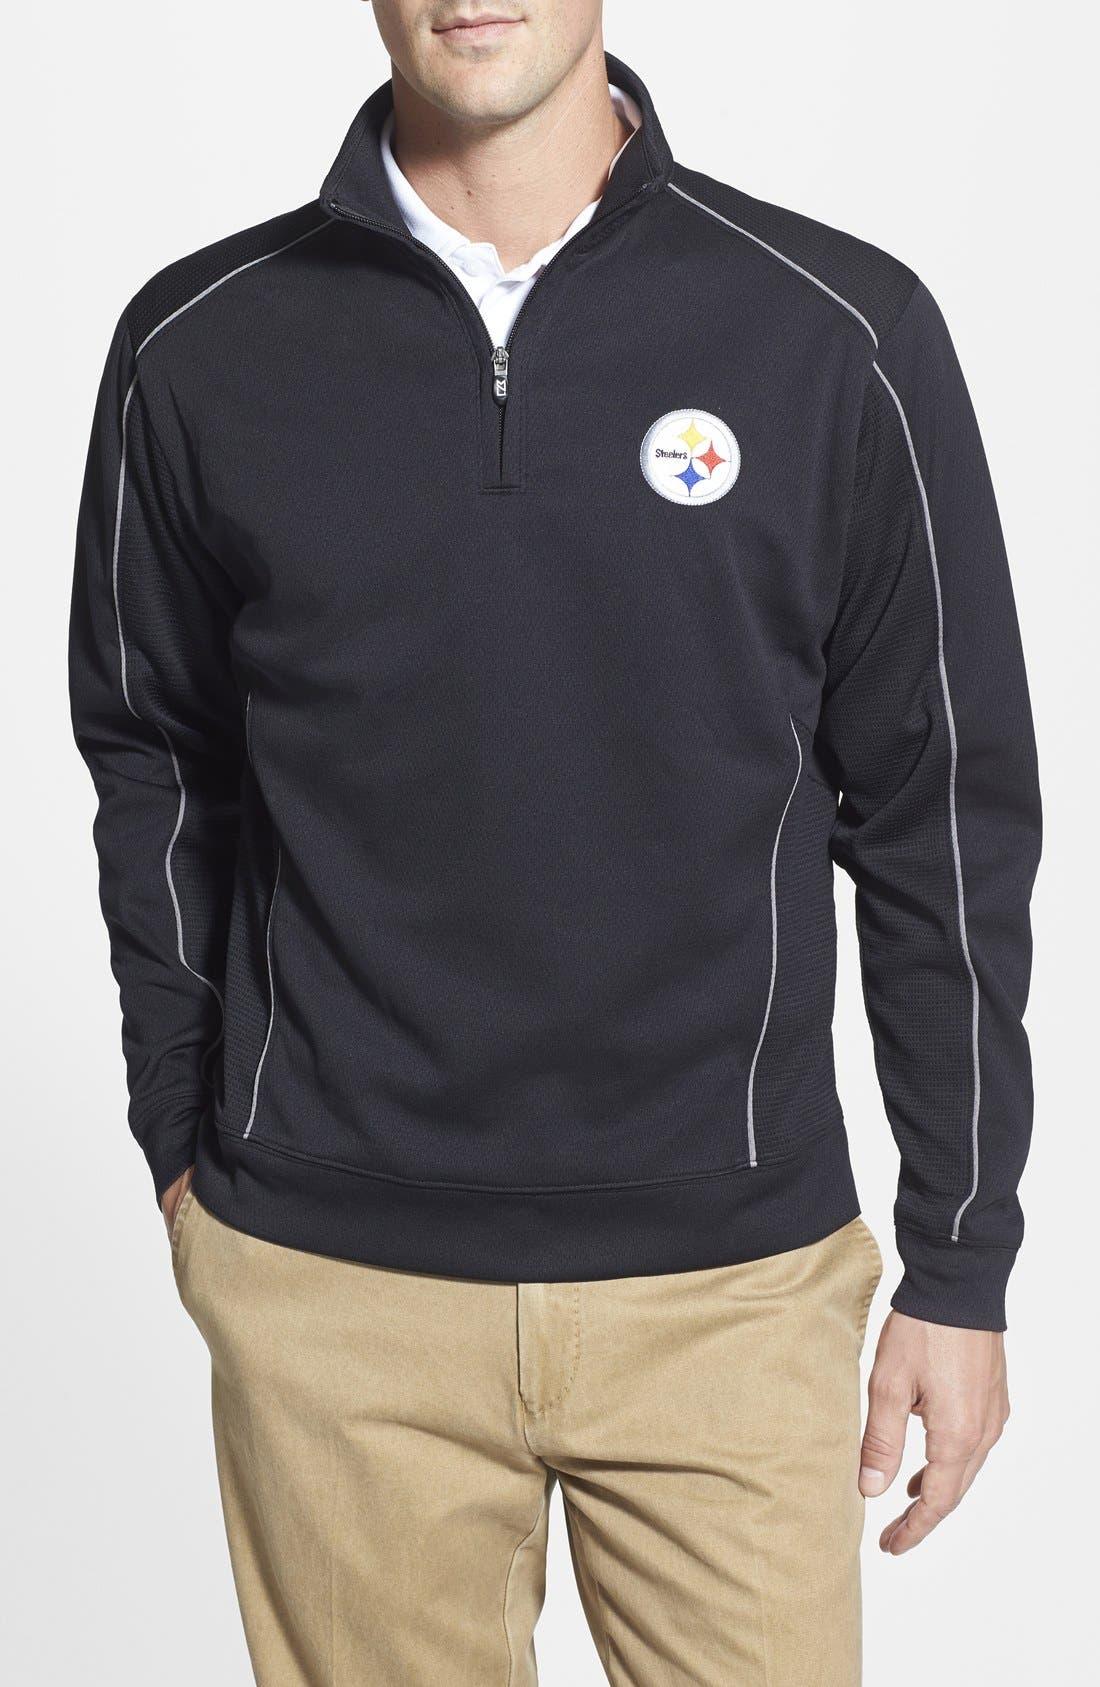 Alternate Image 1 Selected - Cutter & Buck Pittsburgh Steelers - Edge DryTec Moisture Wicking Half Zip Pullover